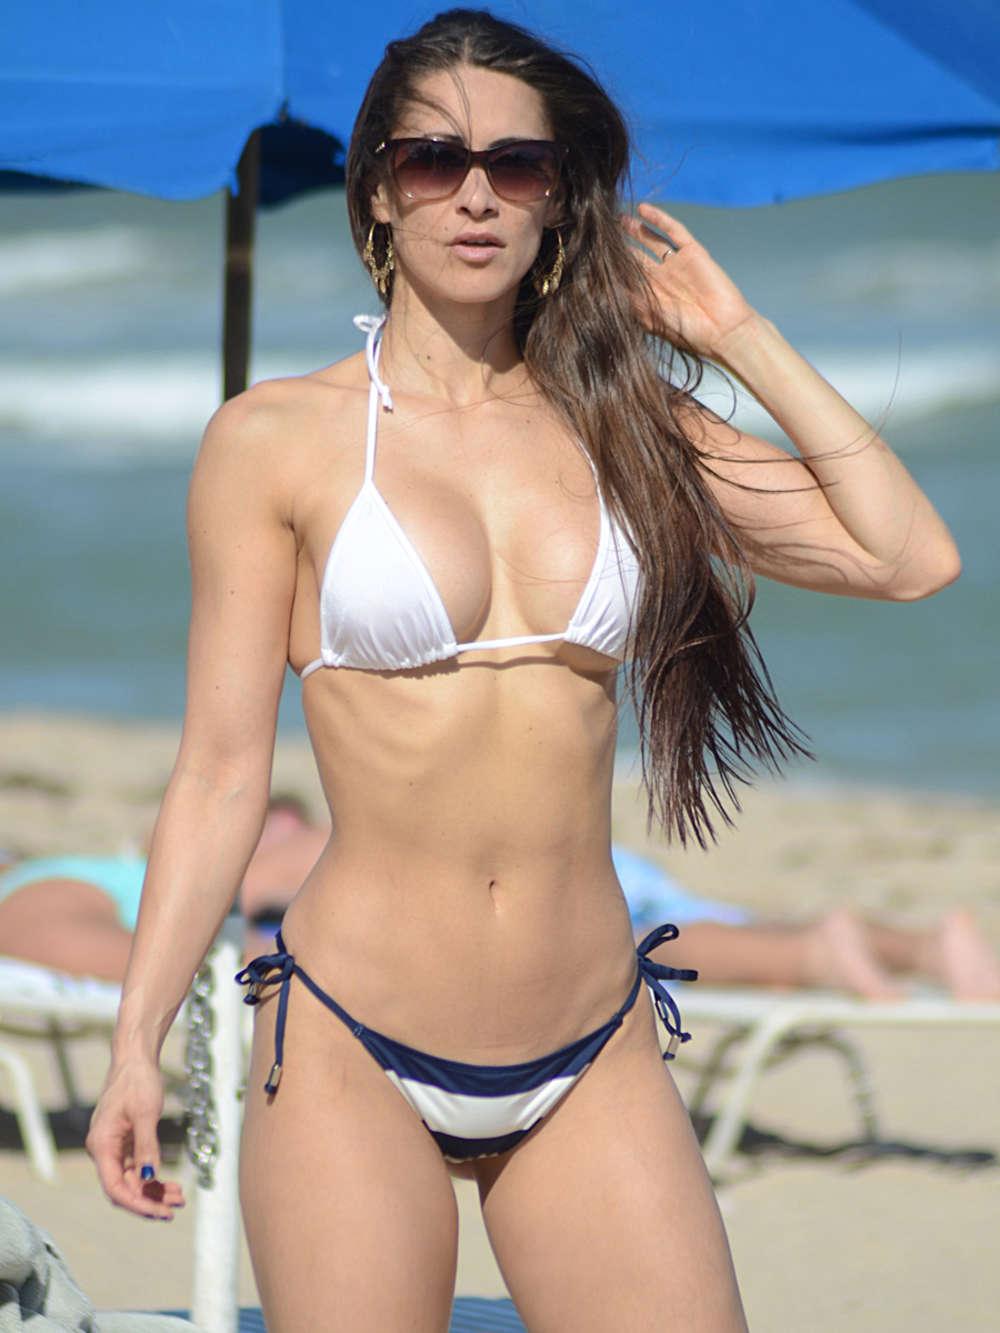 Anais Zanotti Hot anais zanotti hot in bikini -04 | gotceleb